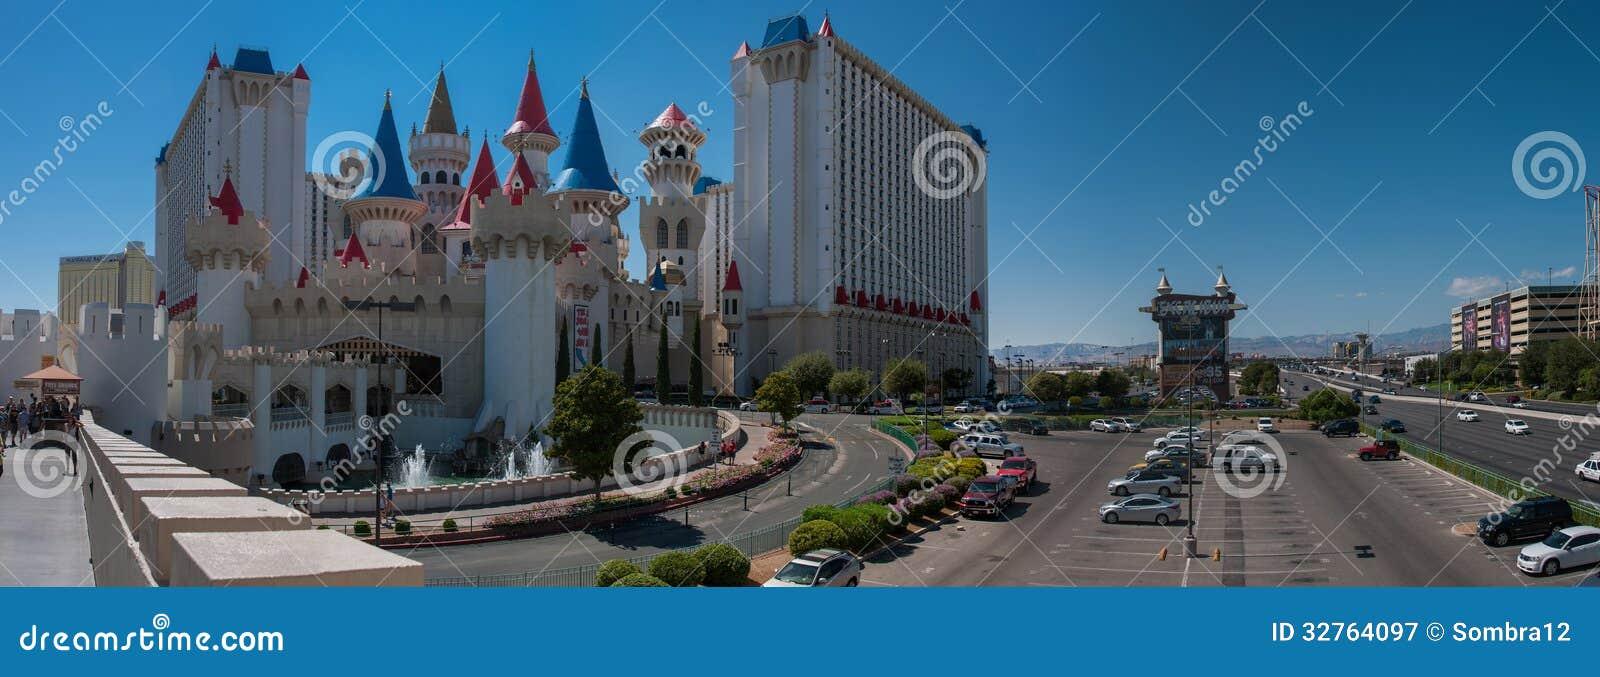 Casino administrator duties